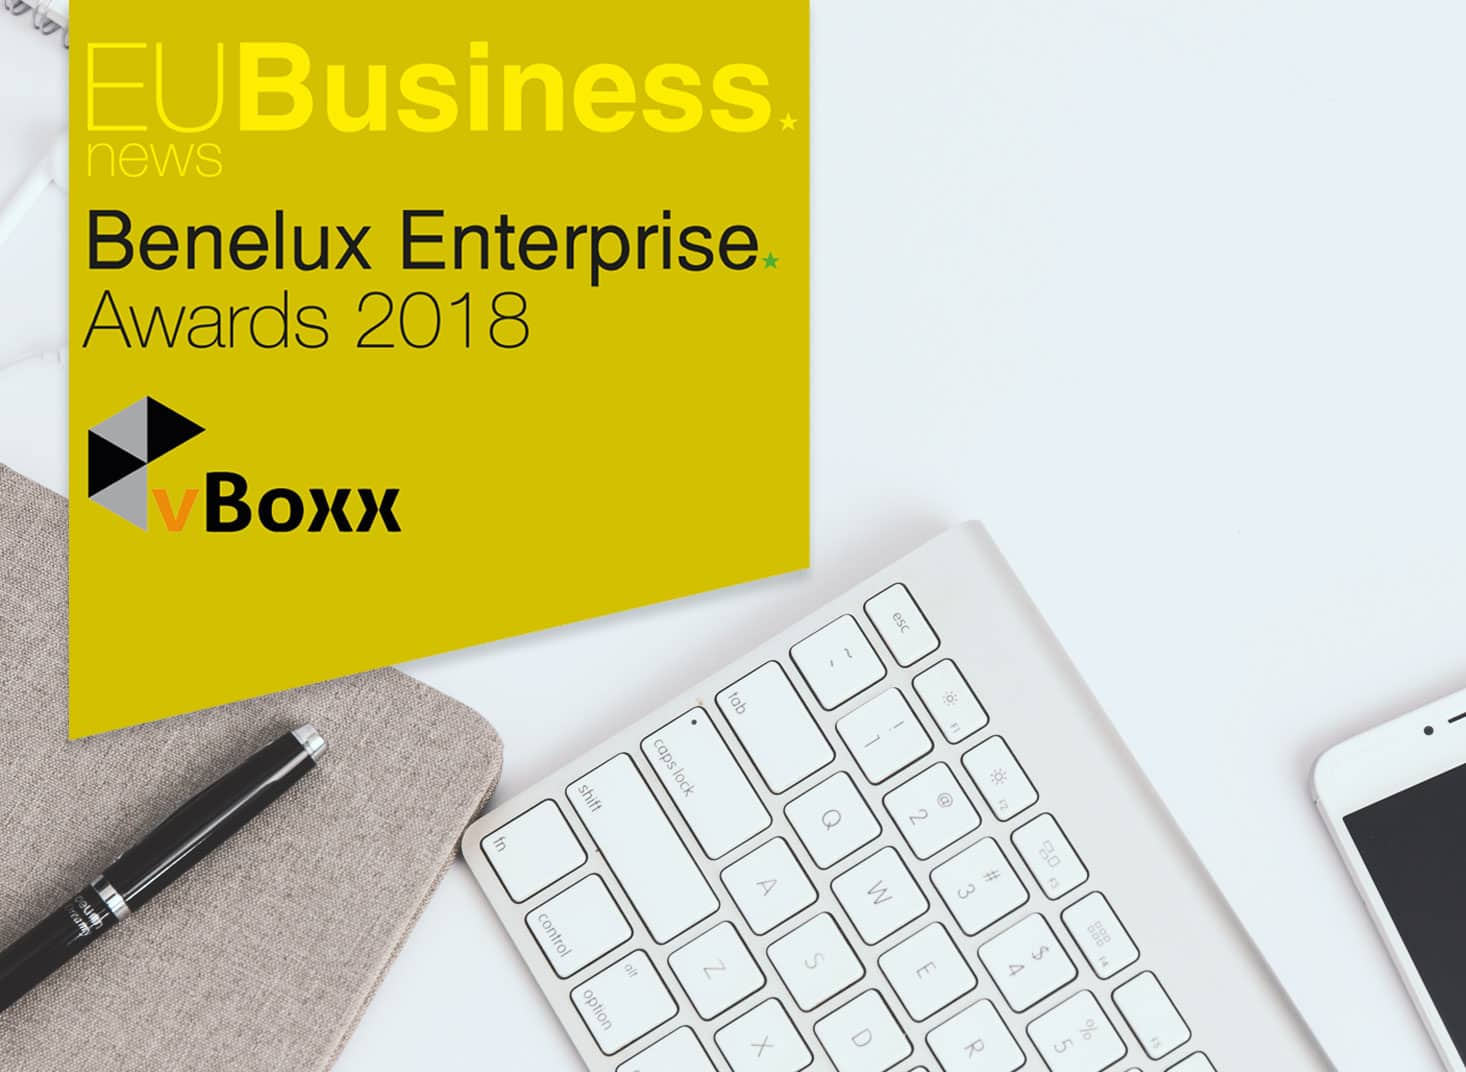 Best Cloud Services Company 2018